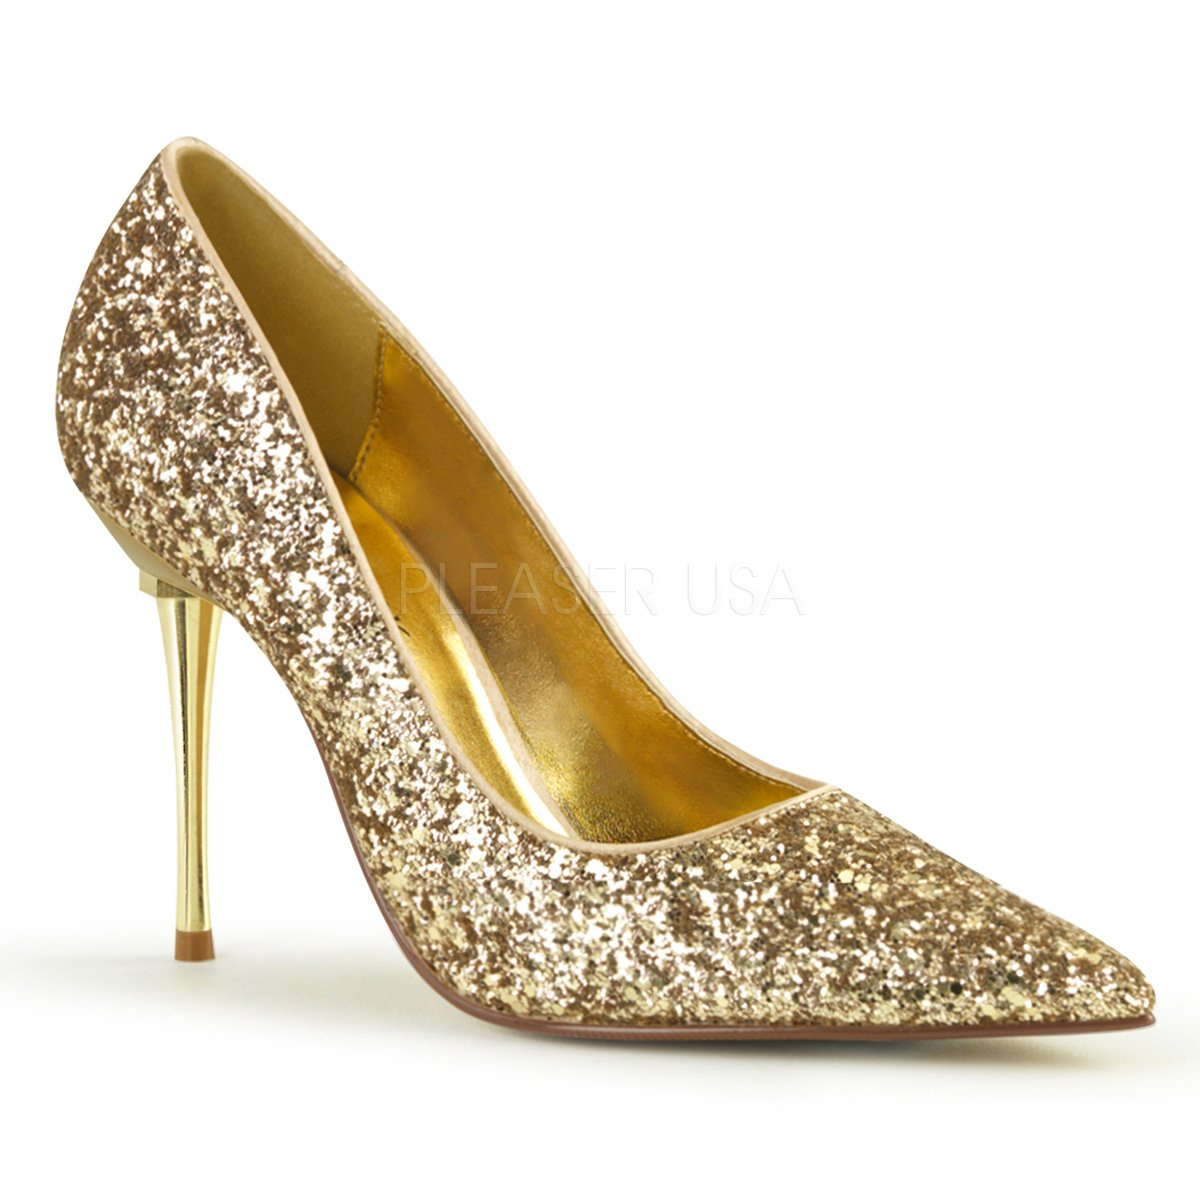 Pleaser , Damen Pumps Mehrfarbig Gold GLTR Pu